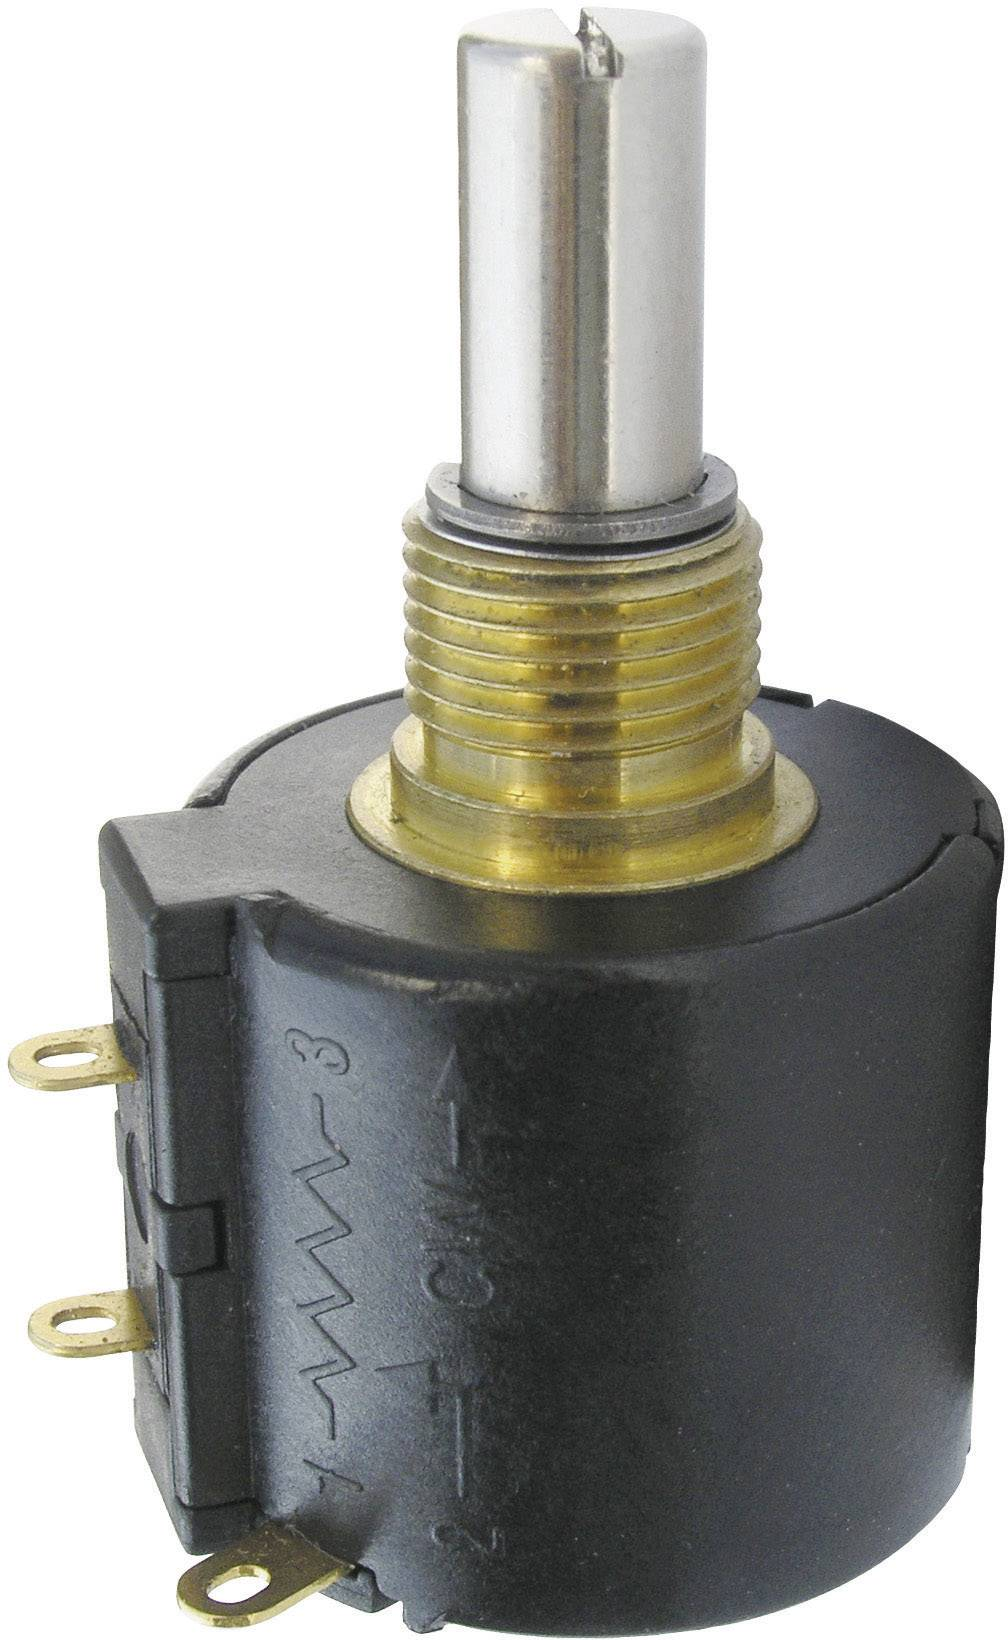 Presný potenciometer Wirewound, 10-cestný mono Bourns 3549S-1AA-103A 3549S-1AA-103A, 2 W, 10 kOhm, 1 ks